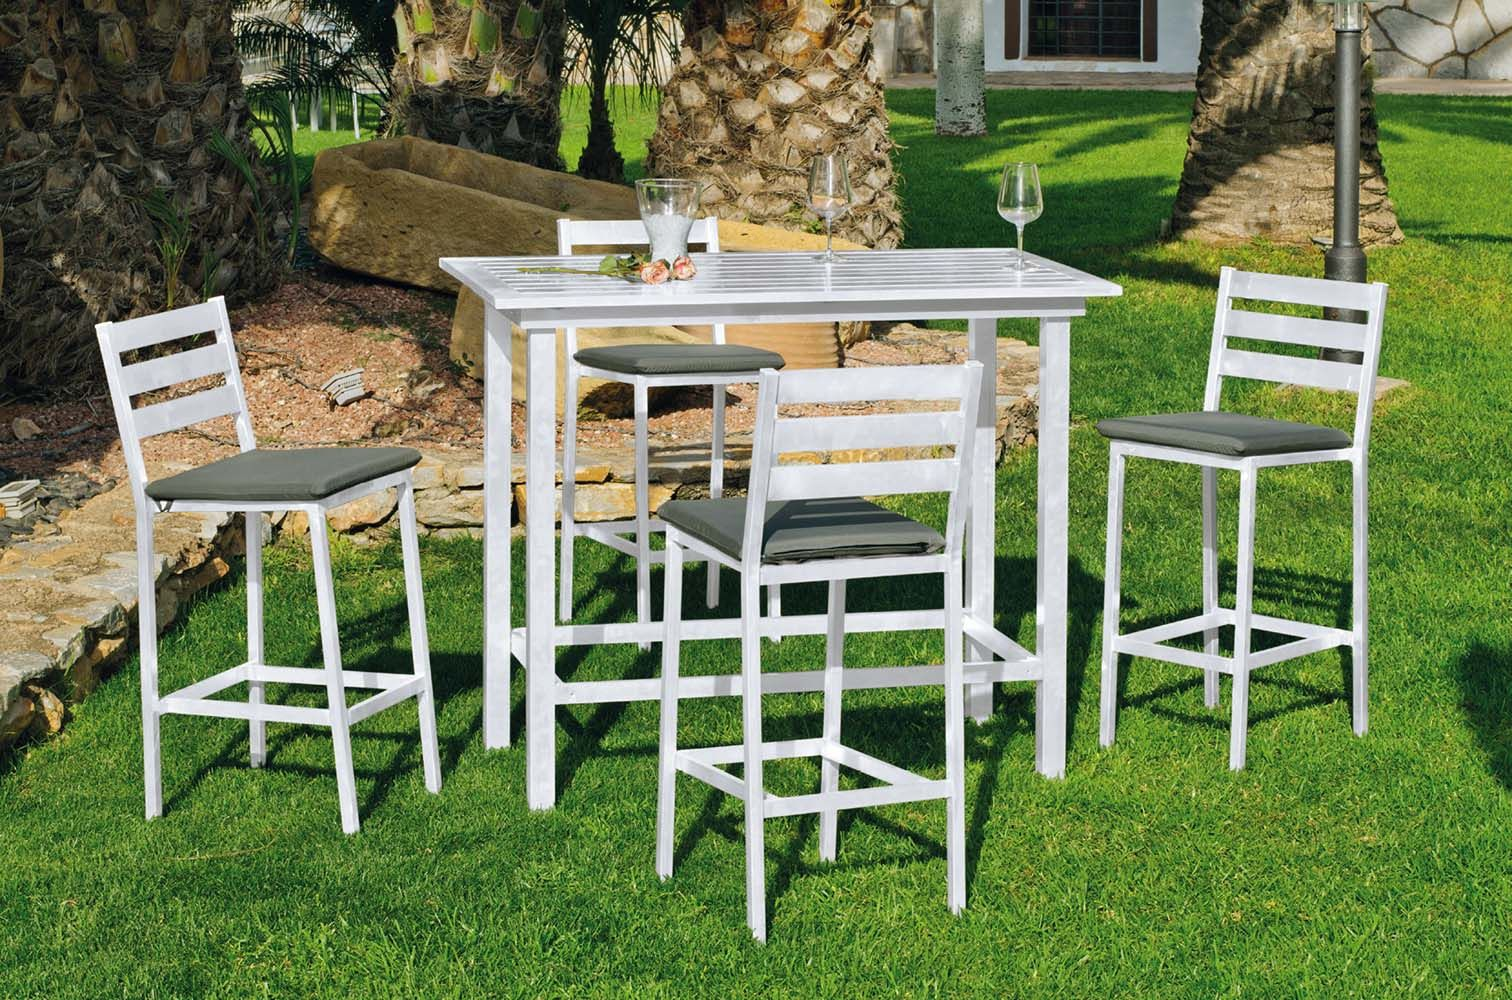 Salon De Jardin Monsieur Bricolage Outdoor Decor Outdoor Furniture Sets Outdoor Furniture